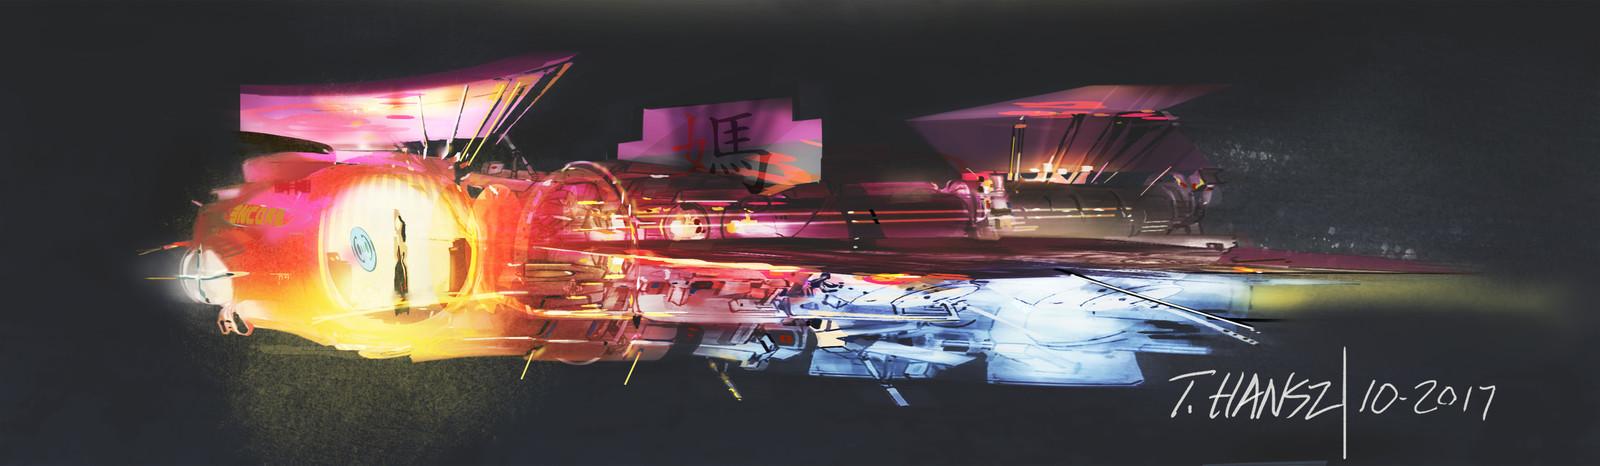 3 Ships sketches